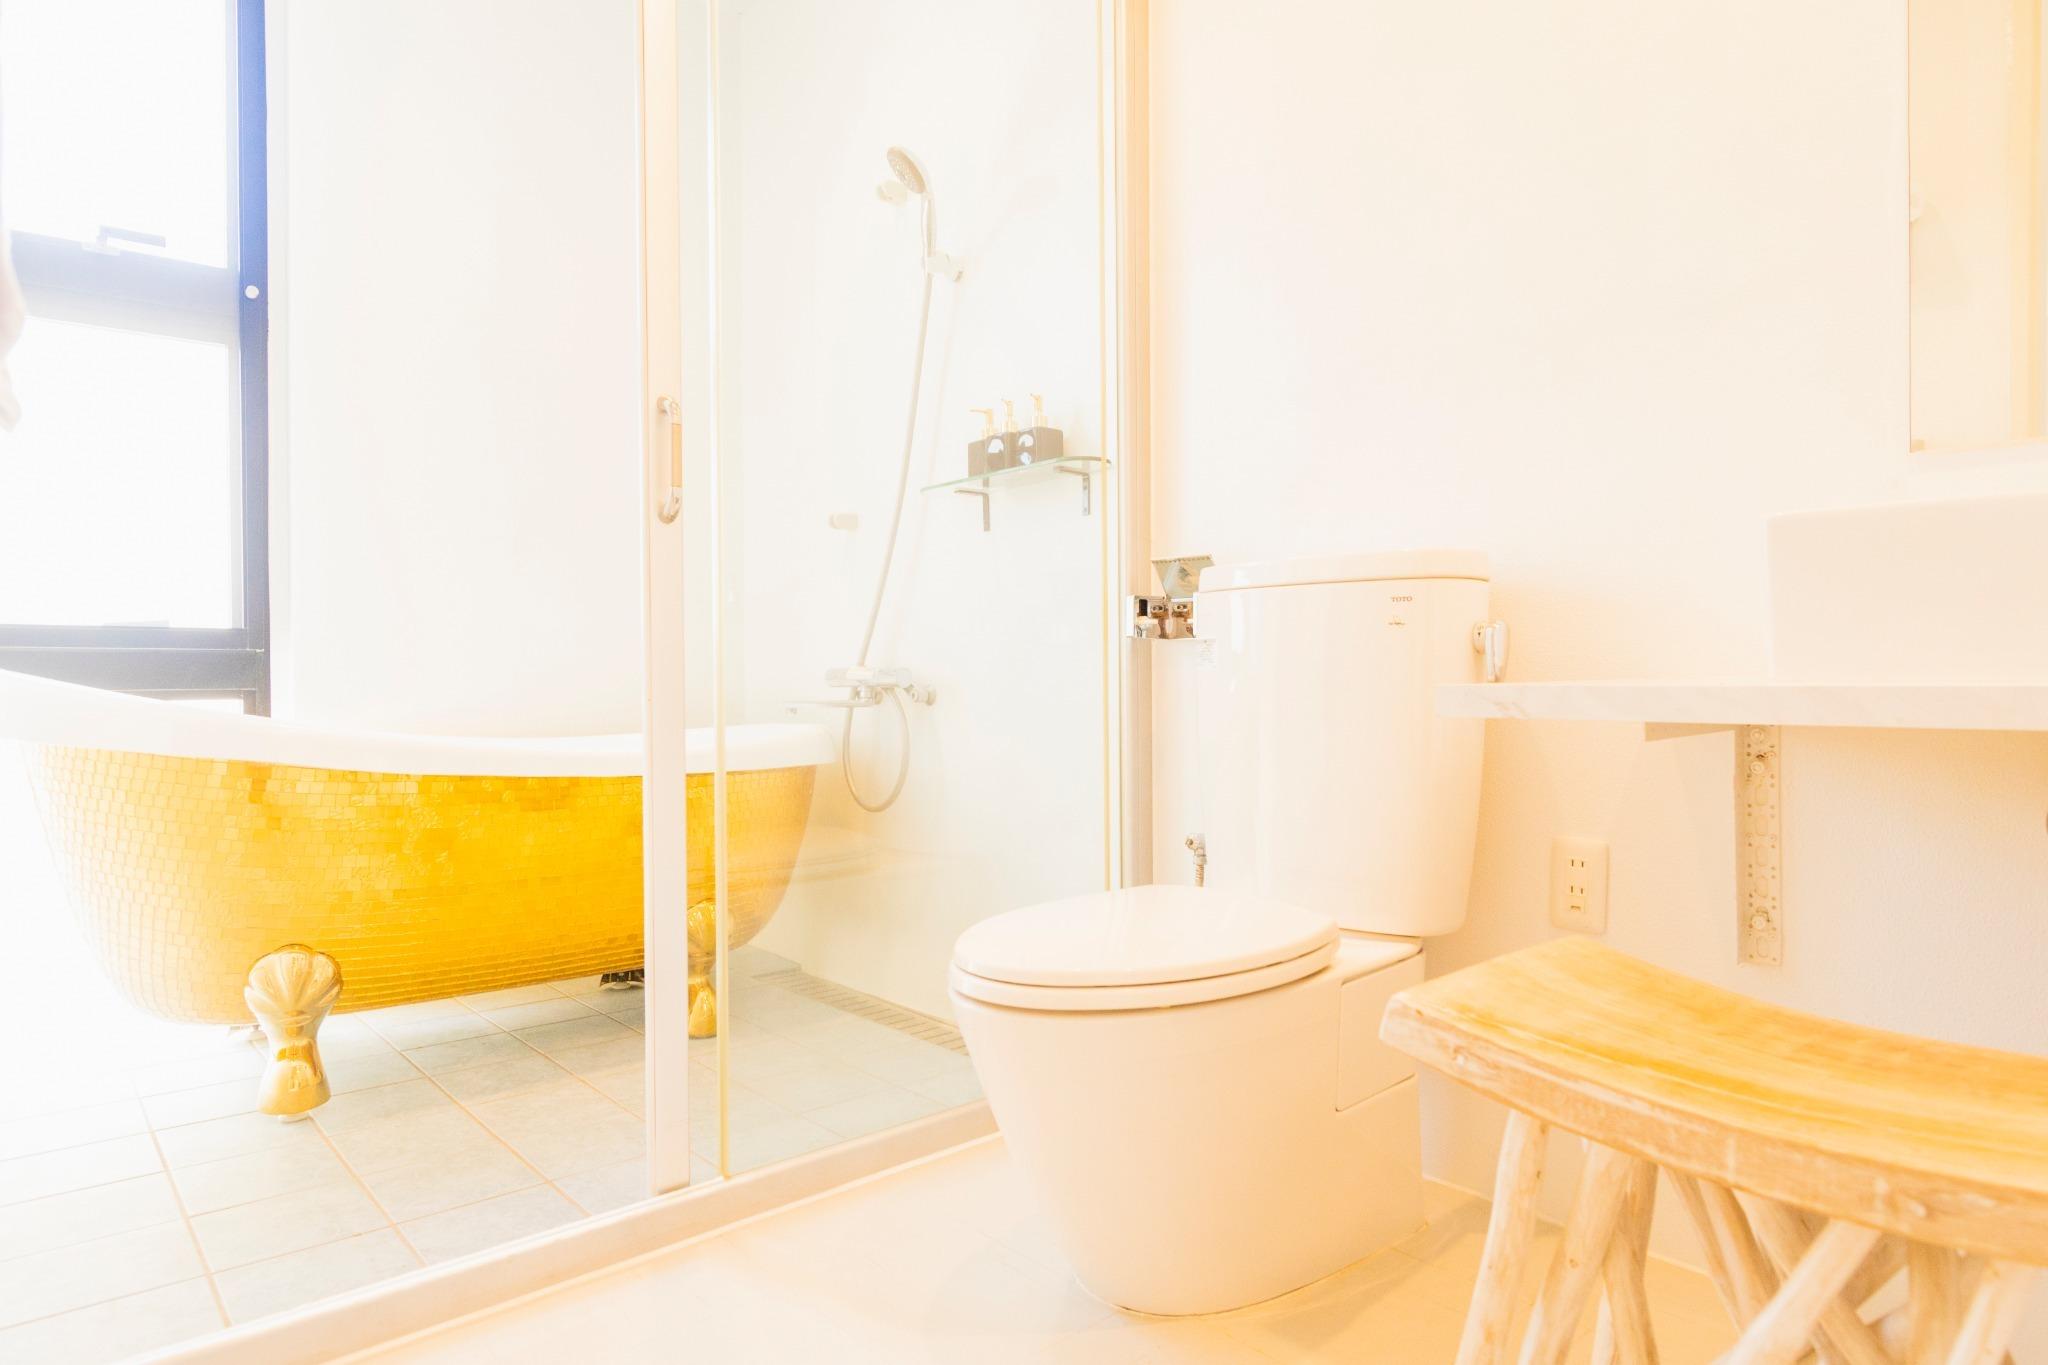 Bathroom in the gold bed room ゴールドベッドルームのバスルーム